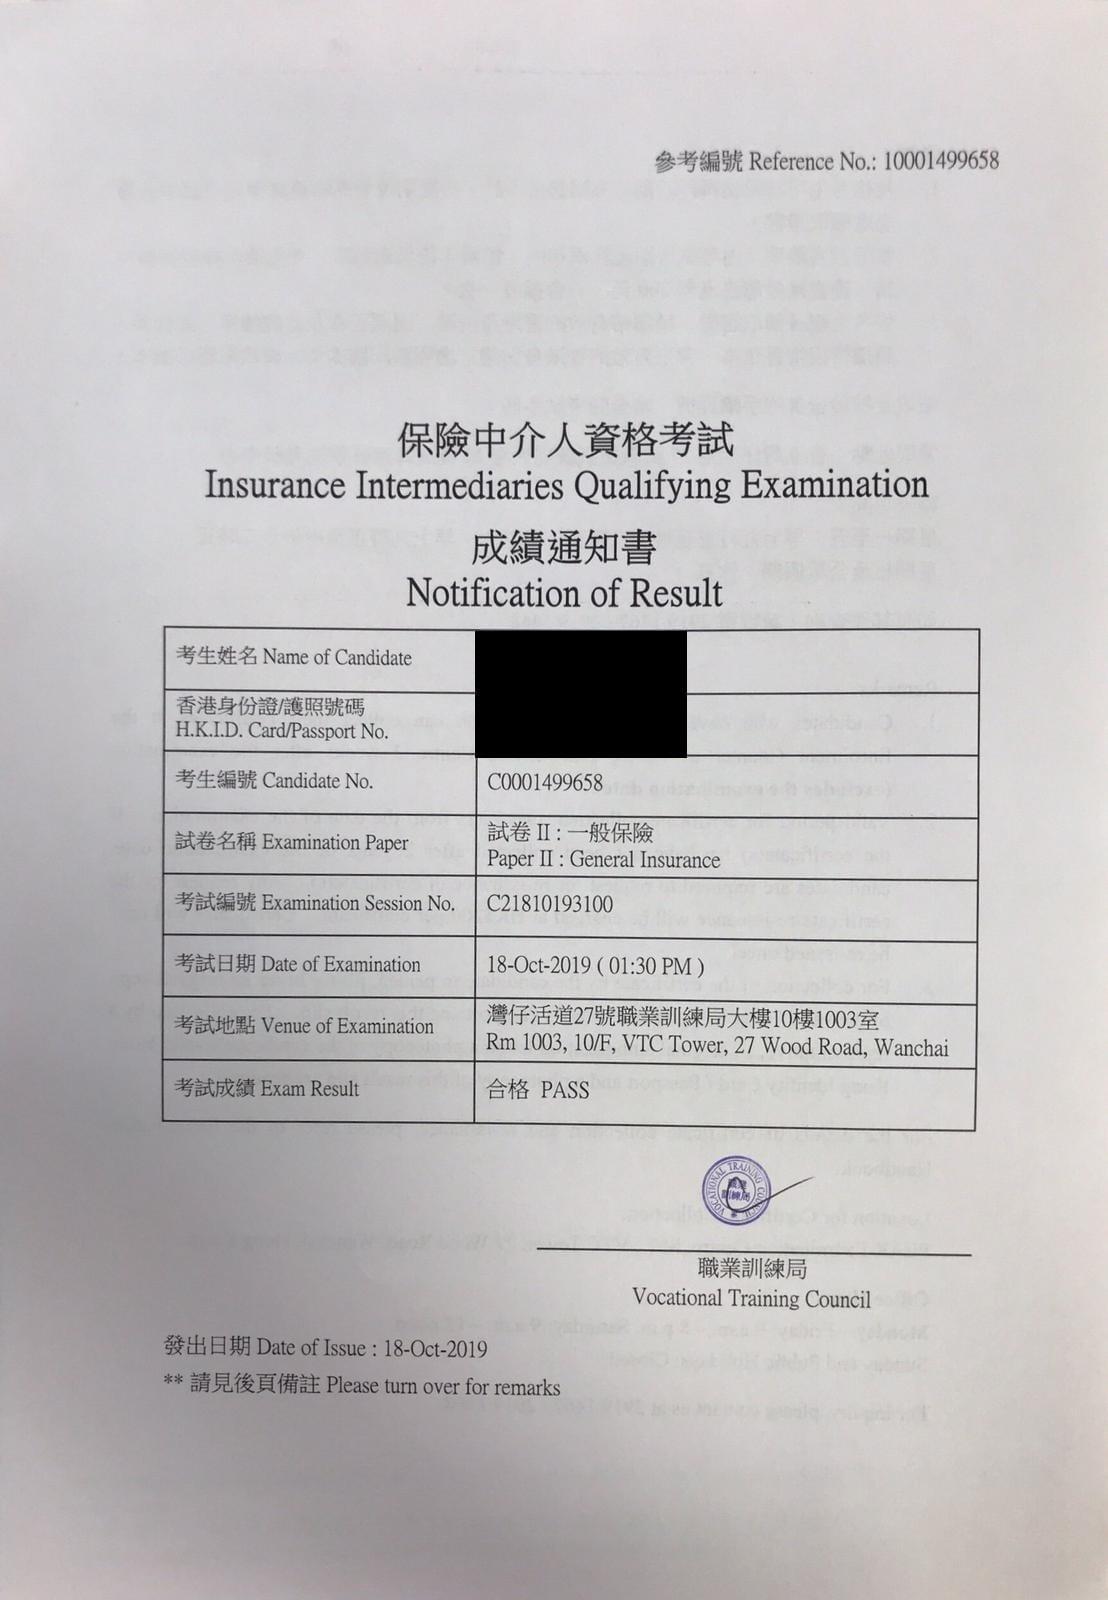 CCL 18/10/2019 IIQE Paper 2 保險中介人資格考試卷二 Pass